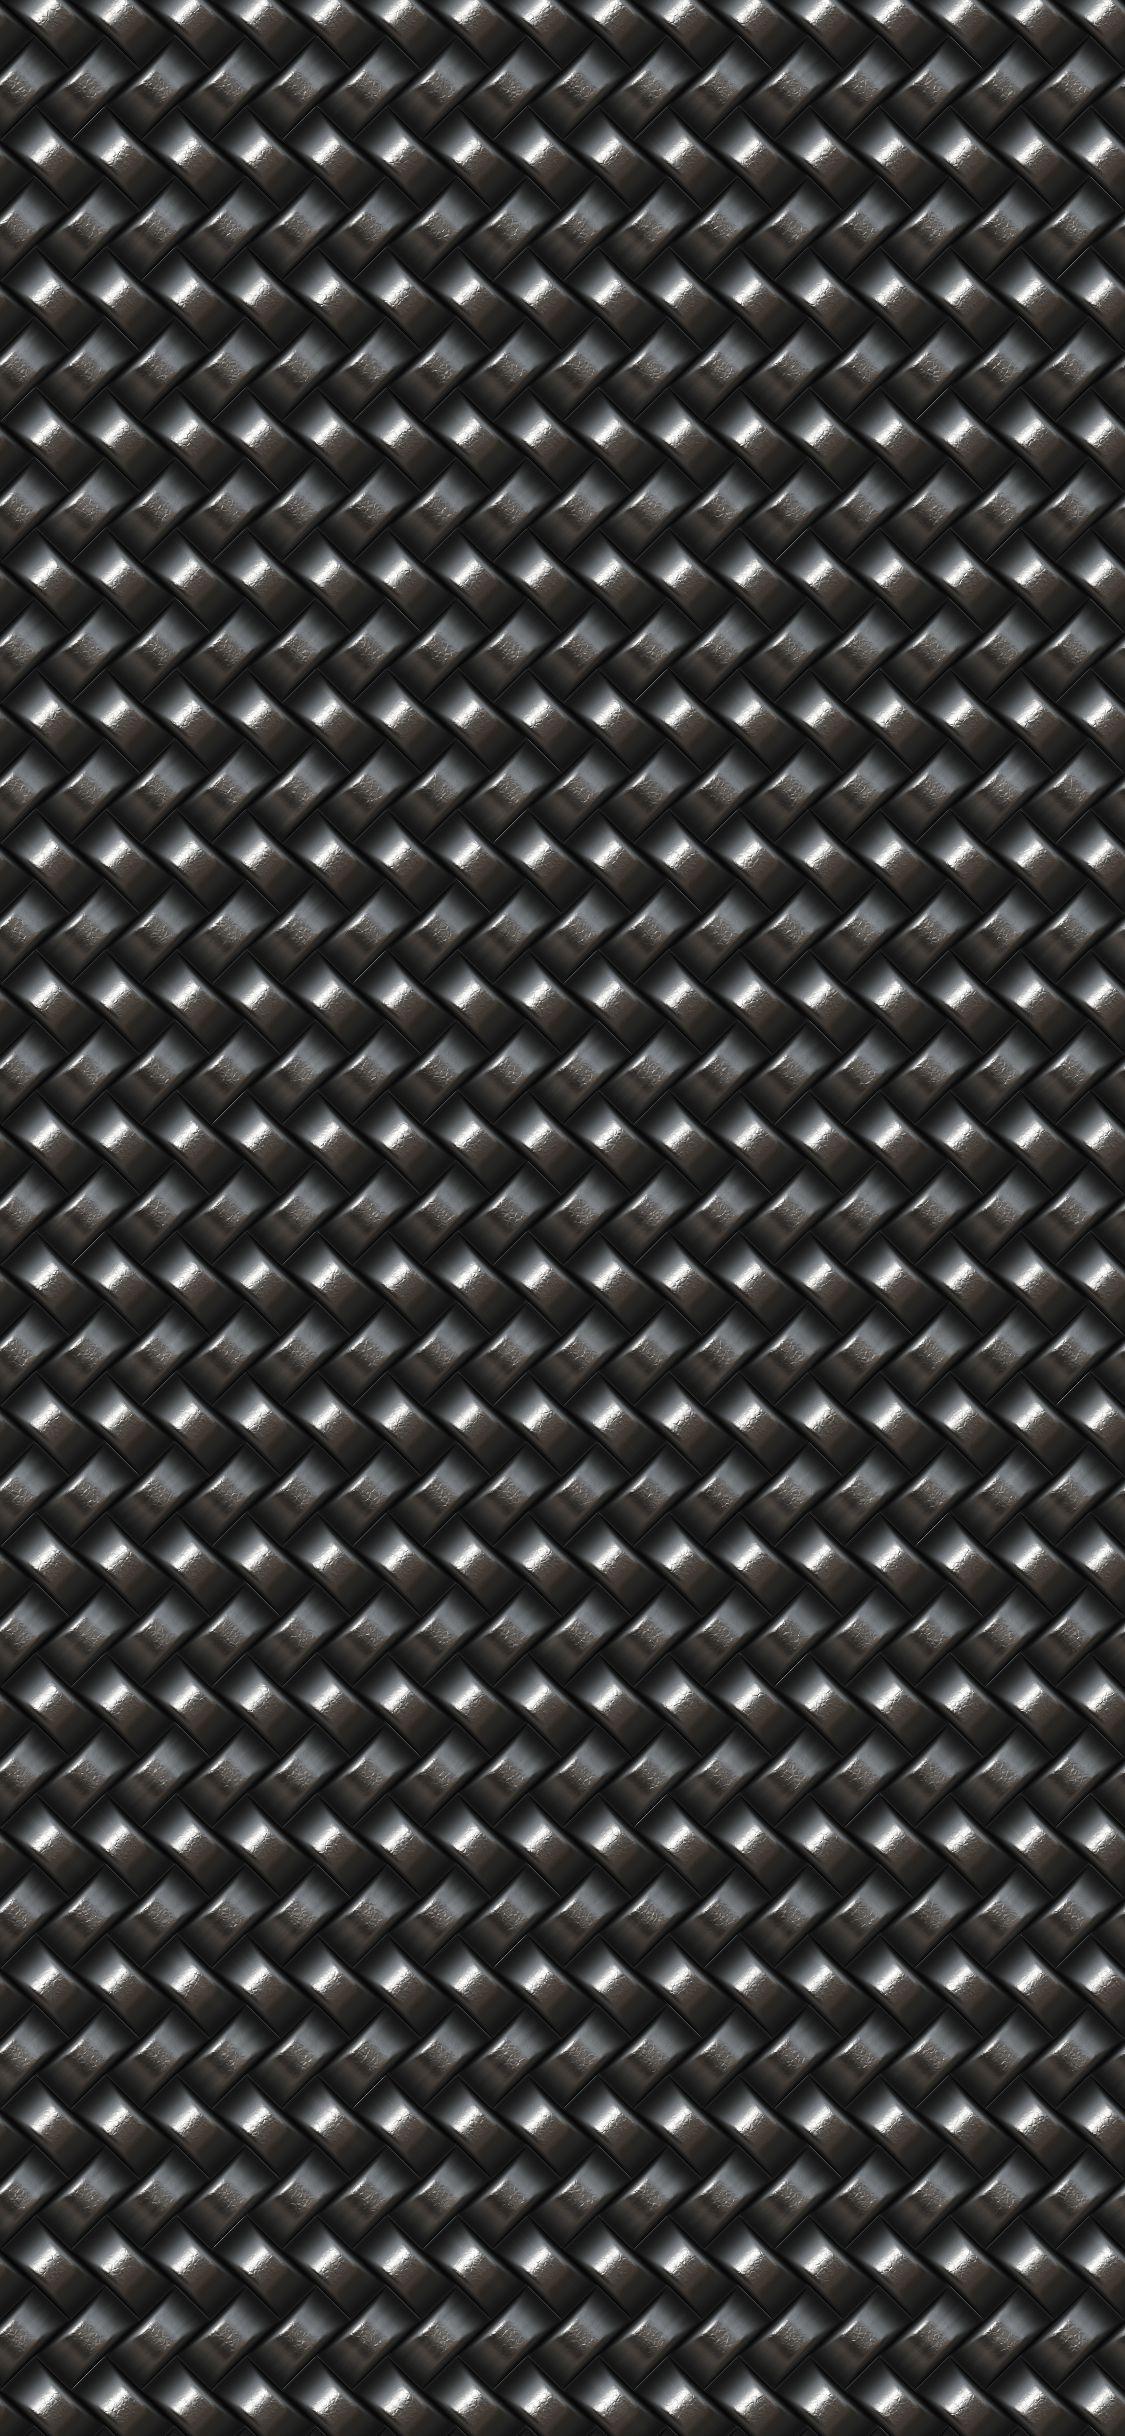 Dark Metal Mesh Iphone X Wallpaper Created By Angelo